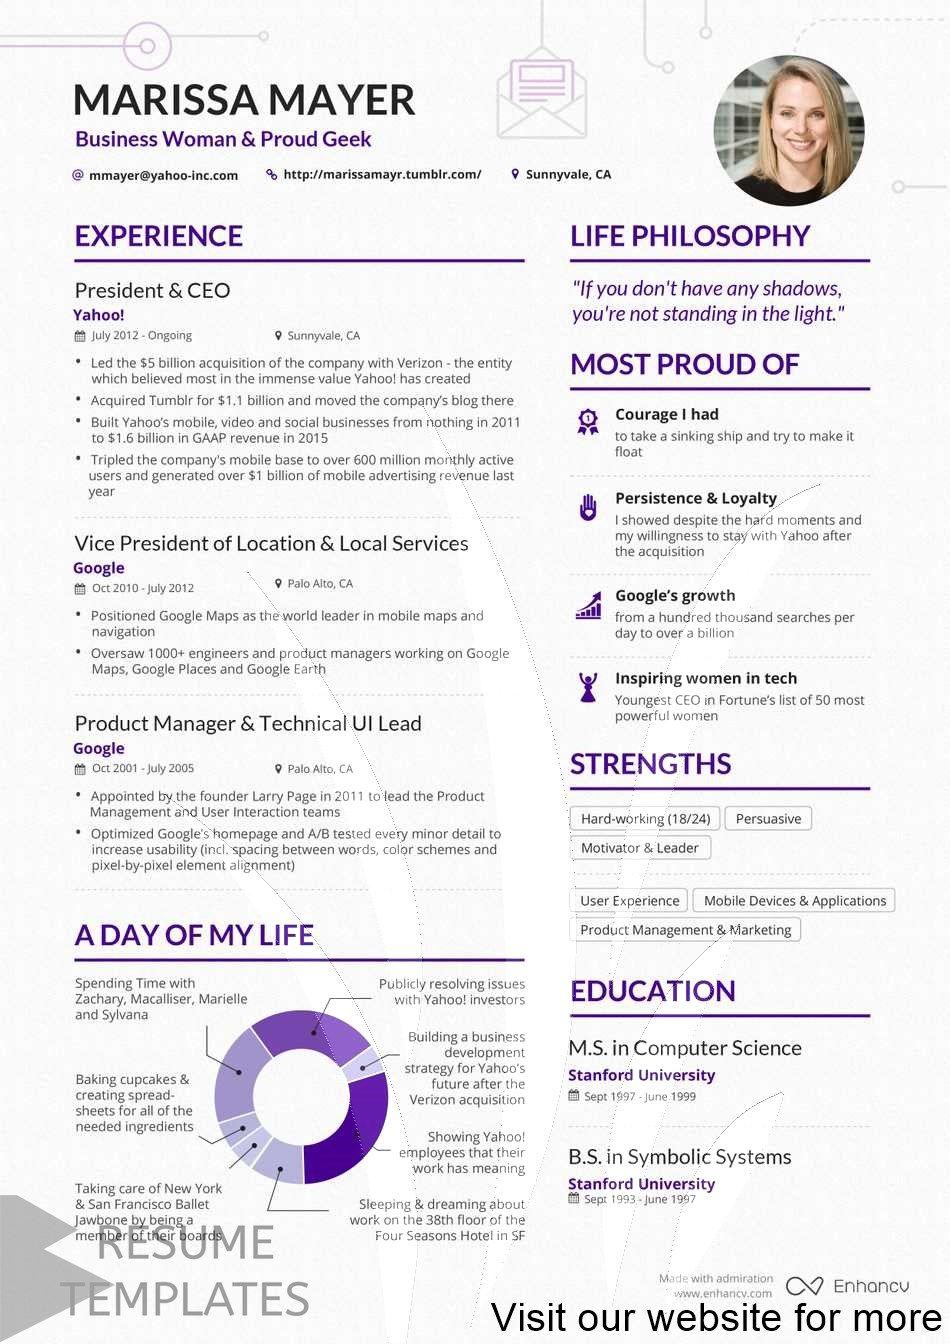 resume template free 2019 in 2020 Free resume builder